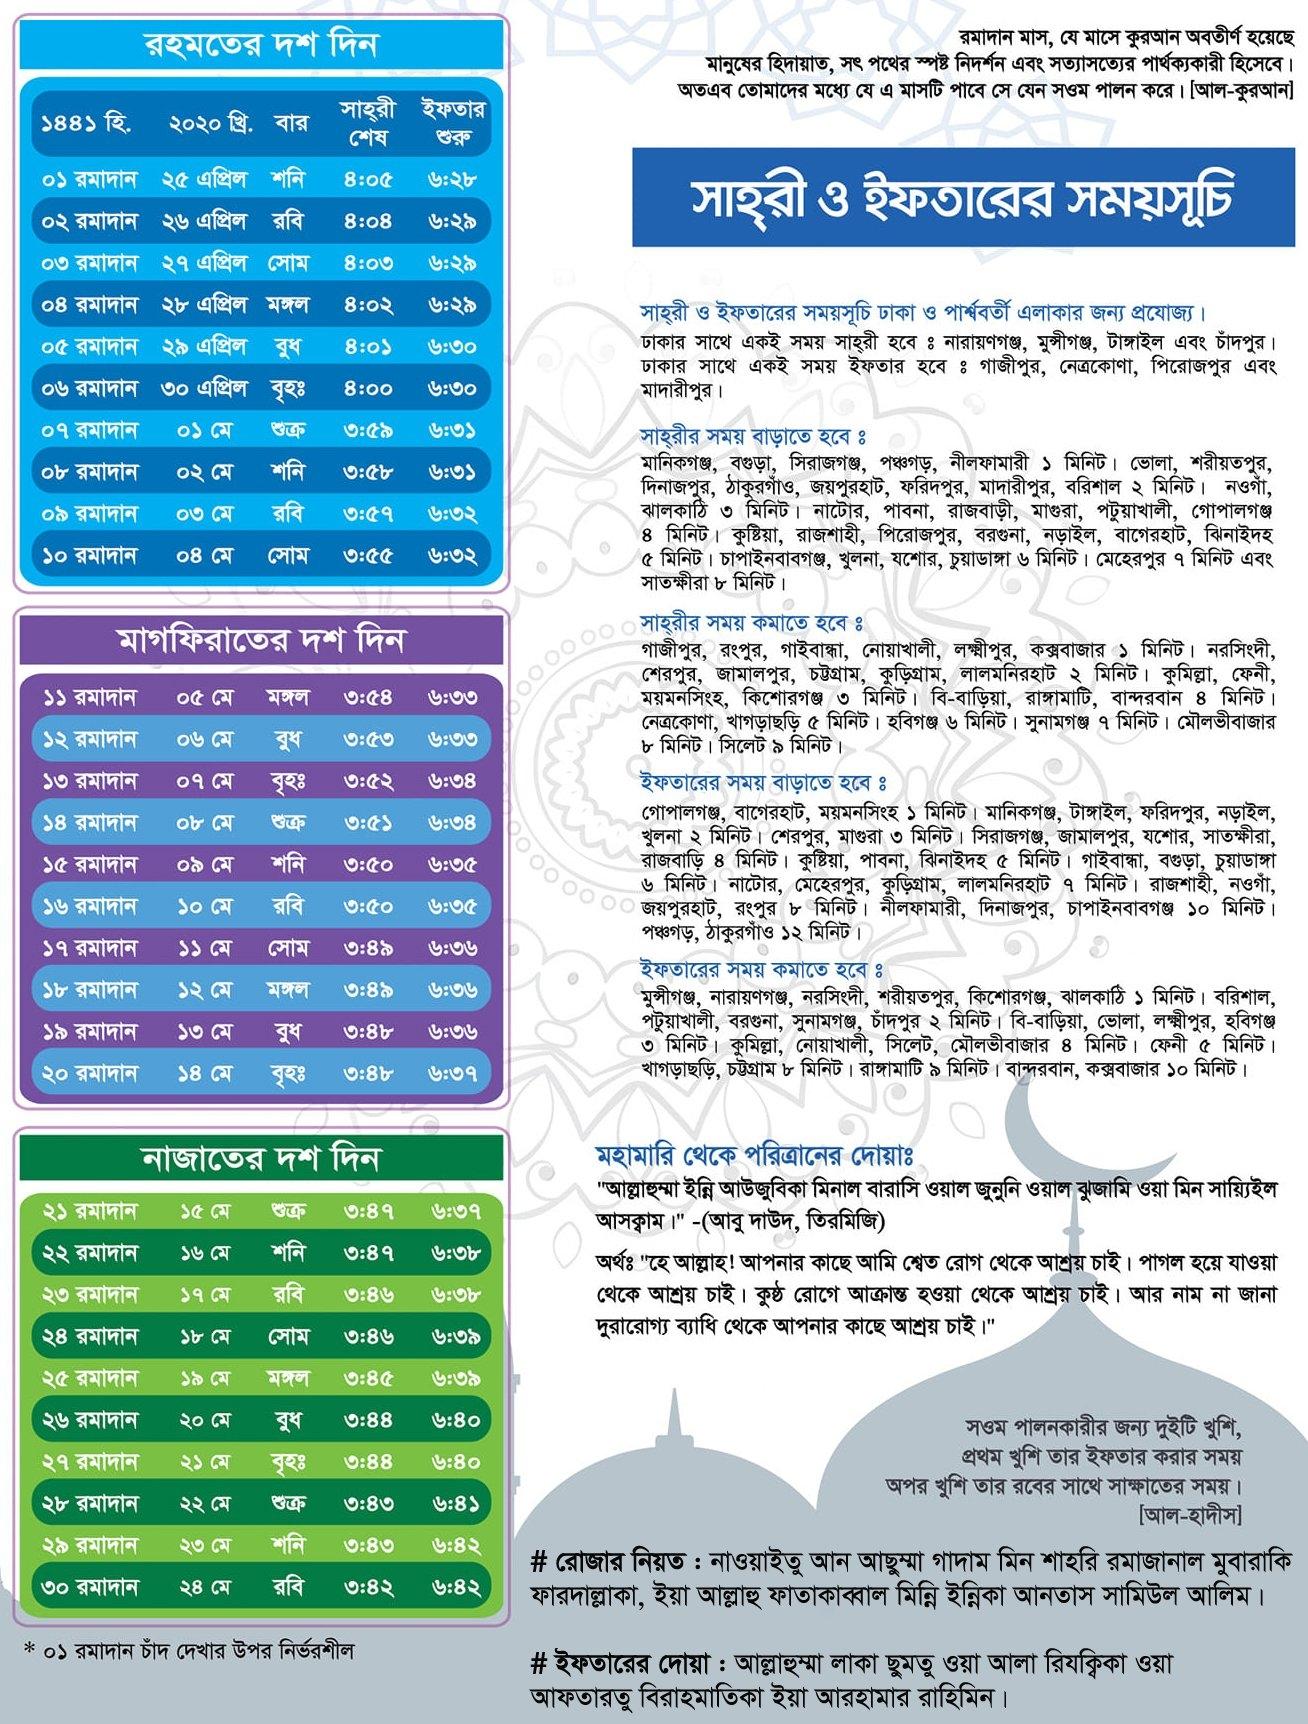 Iftar-Sehri Time-2020 In Bangladesh - Edu Daily for Bangladesh Government Calendar 2021 Photo